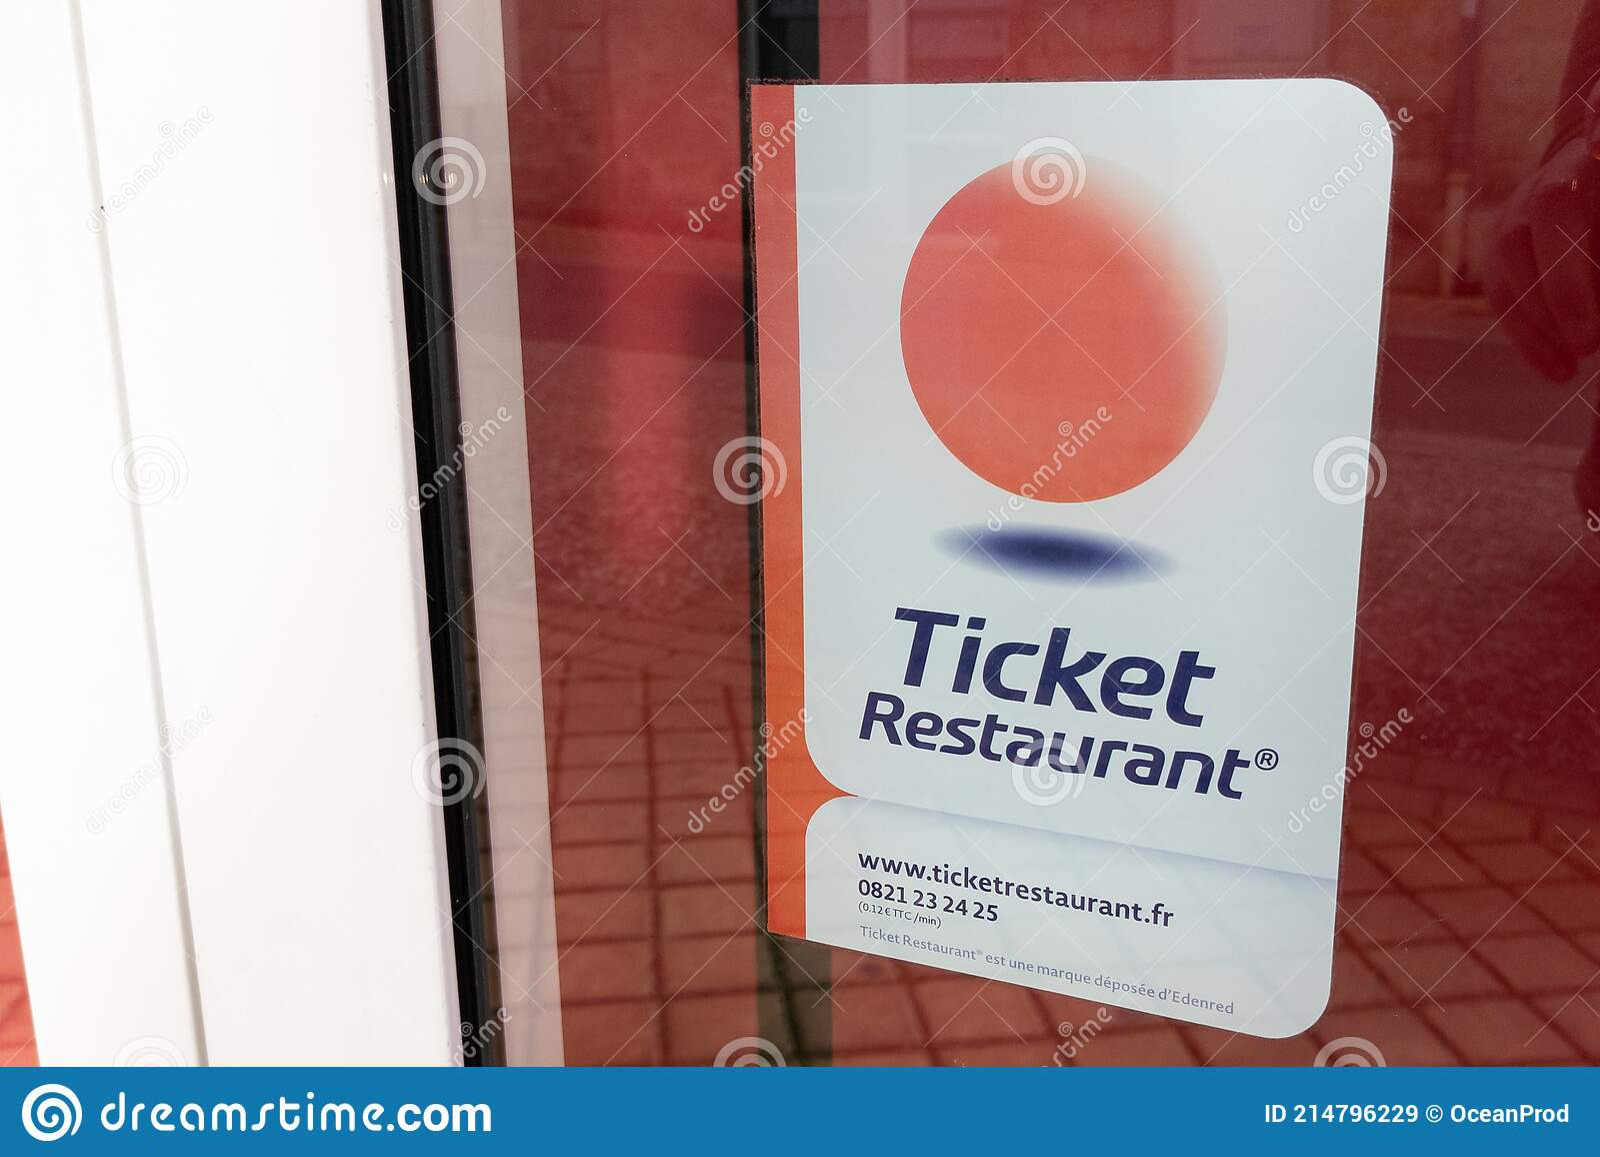 20 Ticket Restaurant Photos   Free & Royalty Free Stock Photos ...